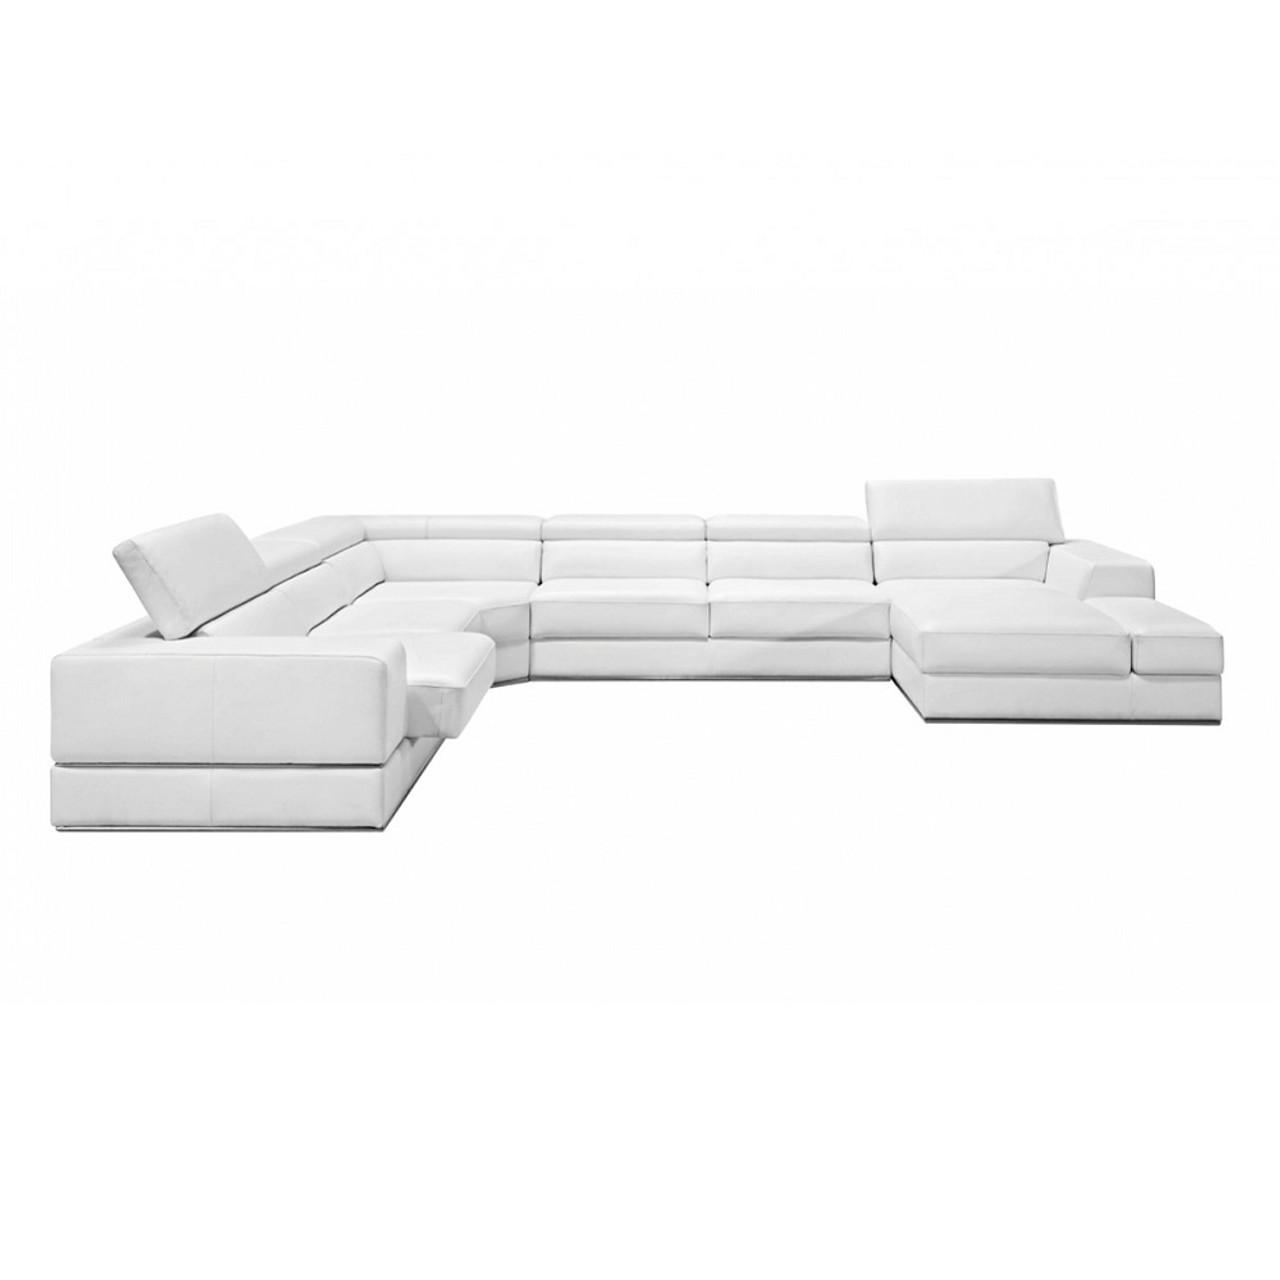 ... Divani Casa Pella Modern White Italian Leather Sectional Sofa ...